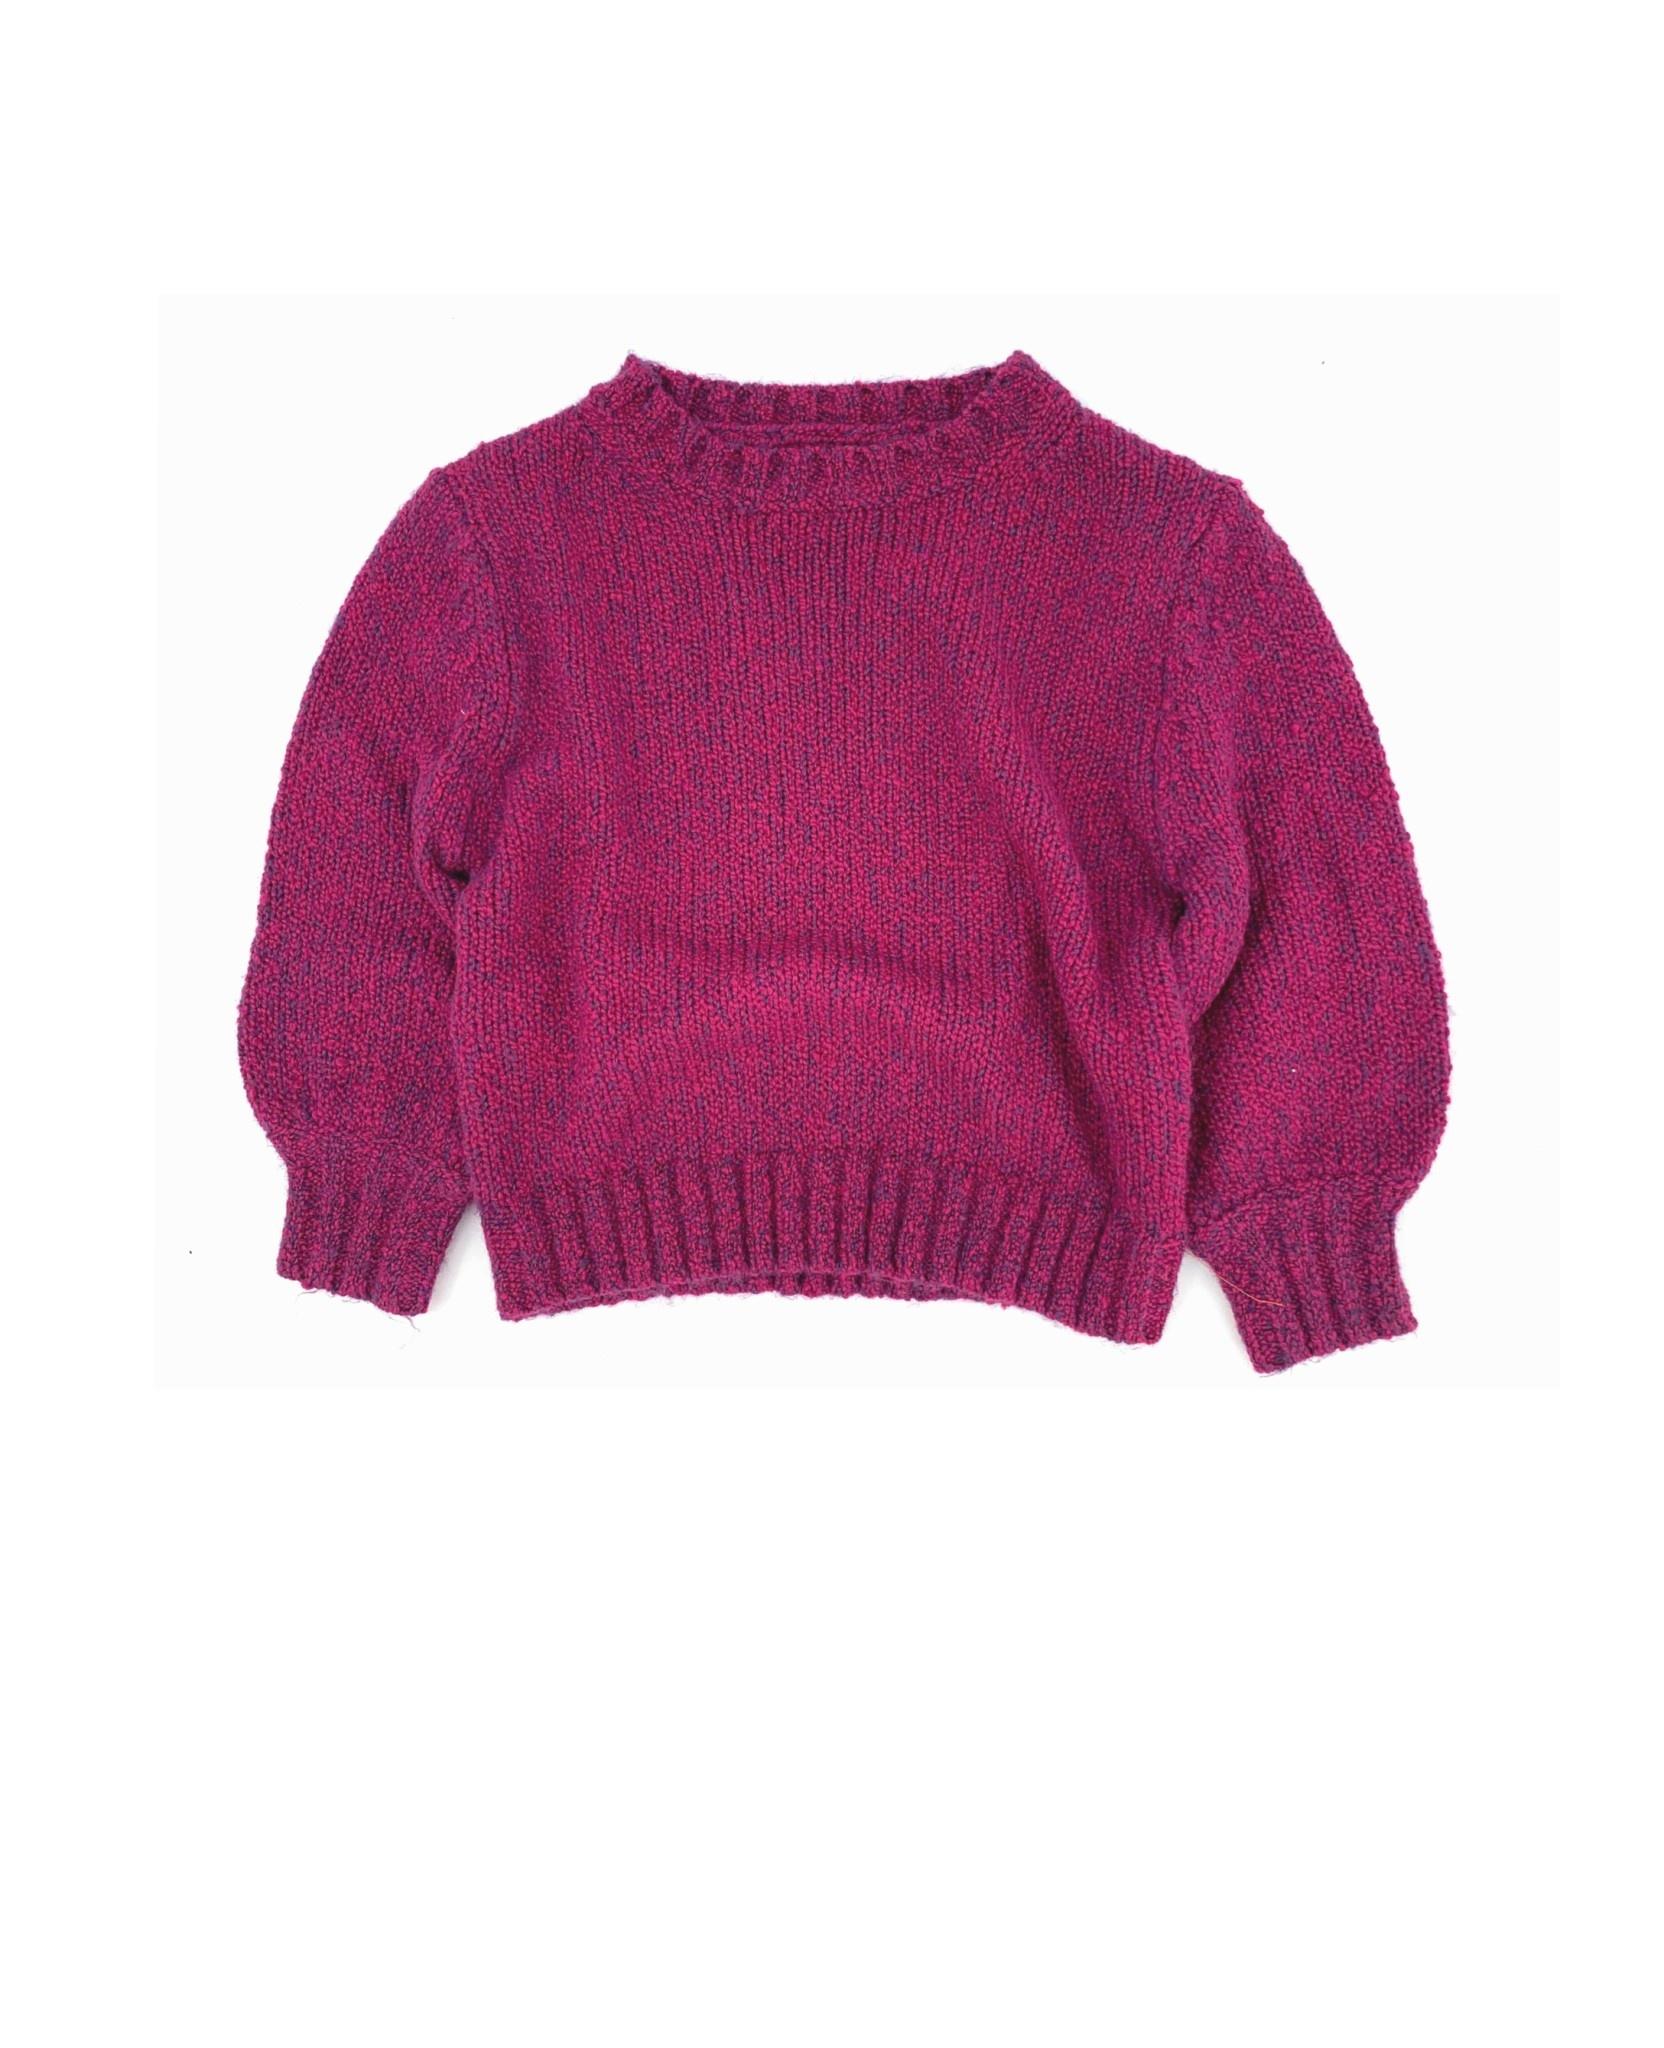 Rough sweater wine twist-1